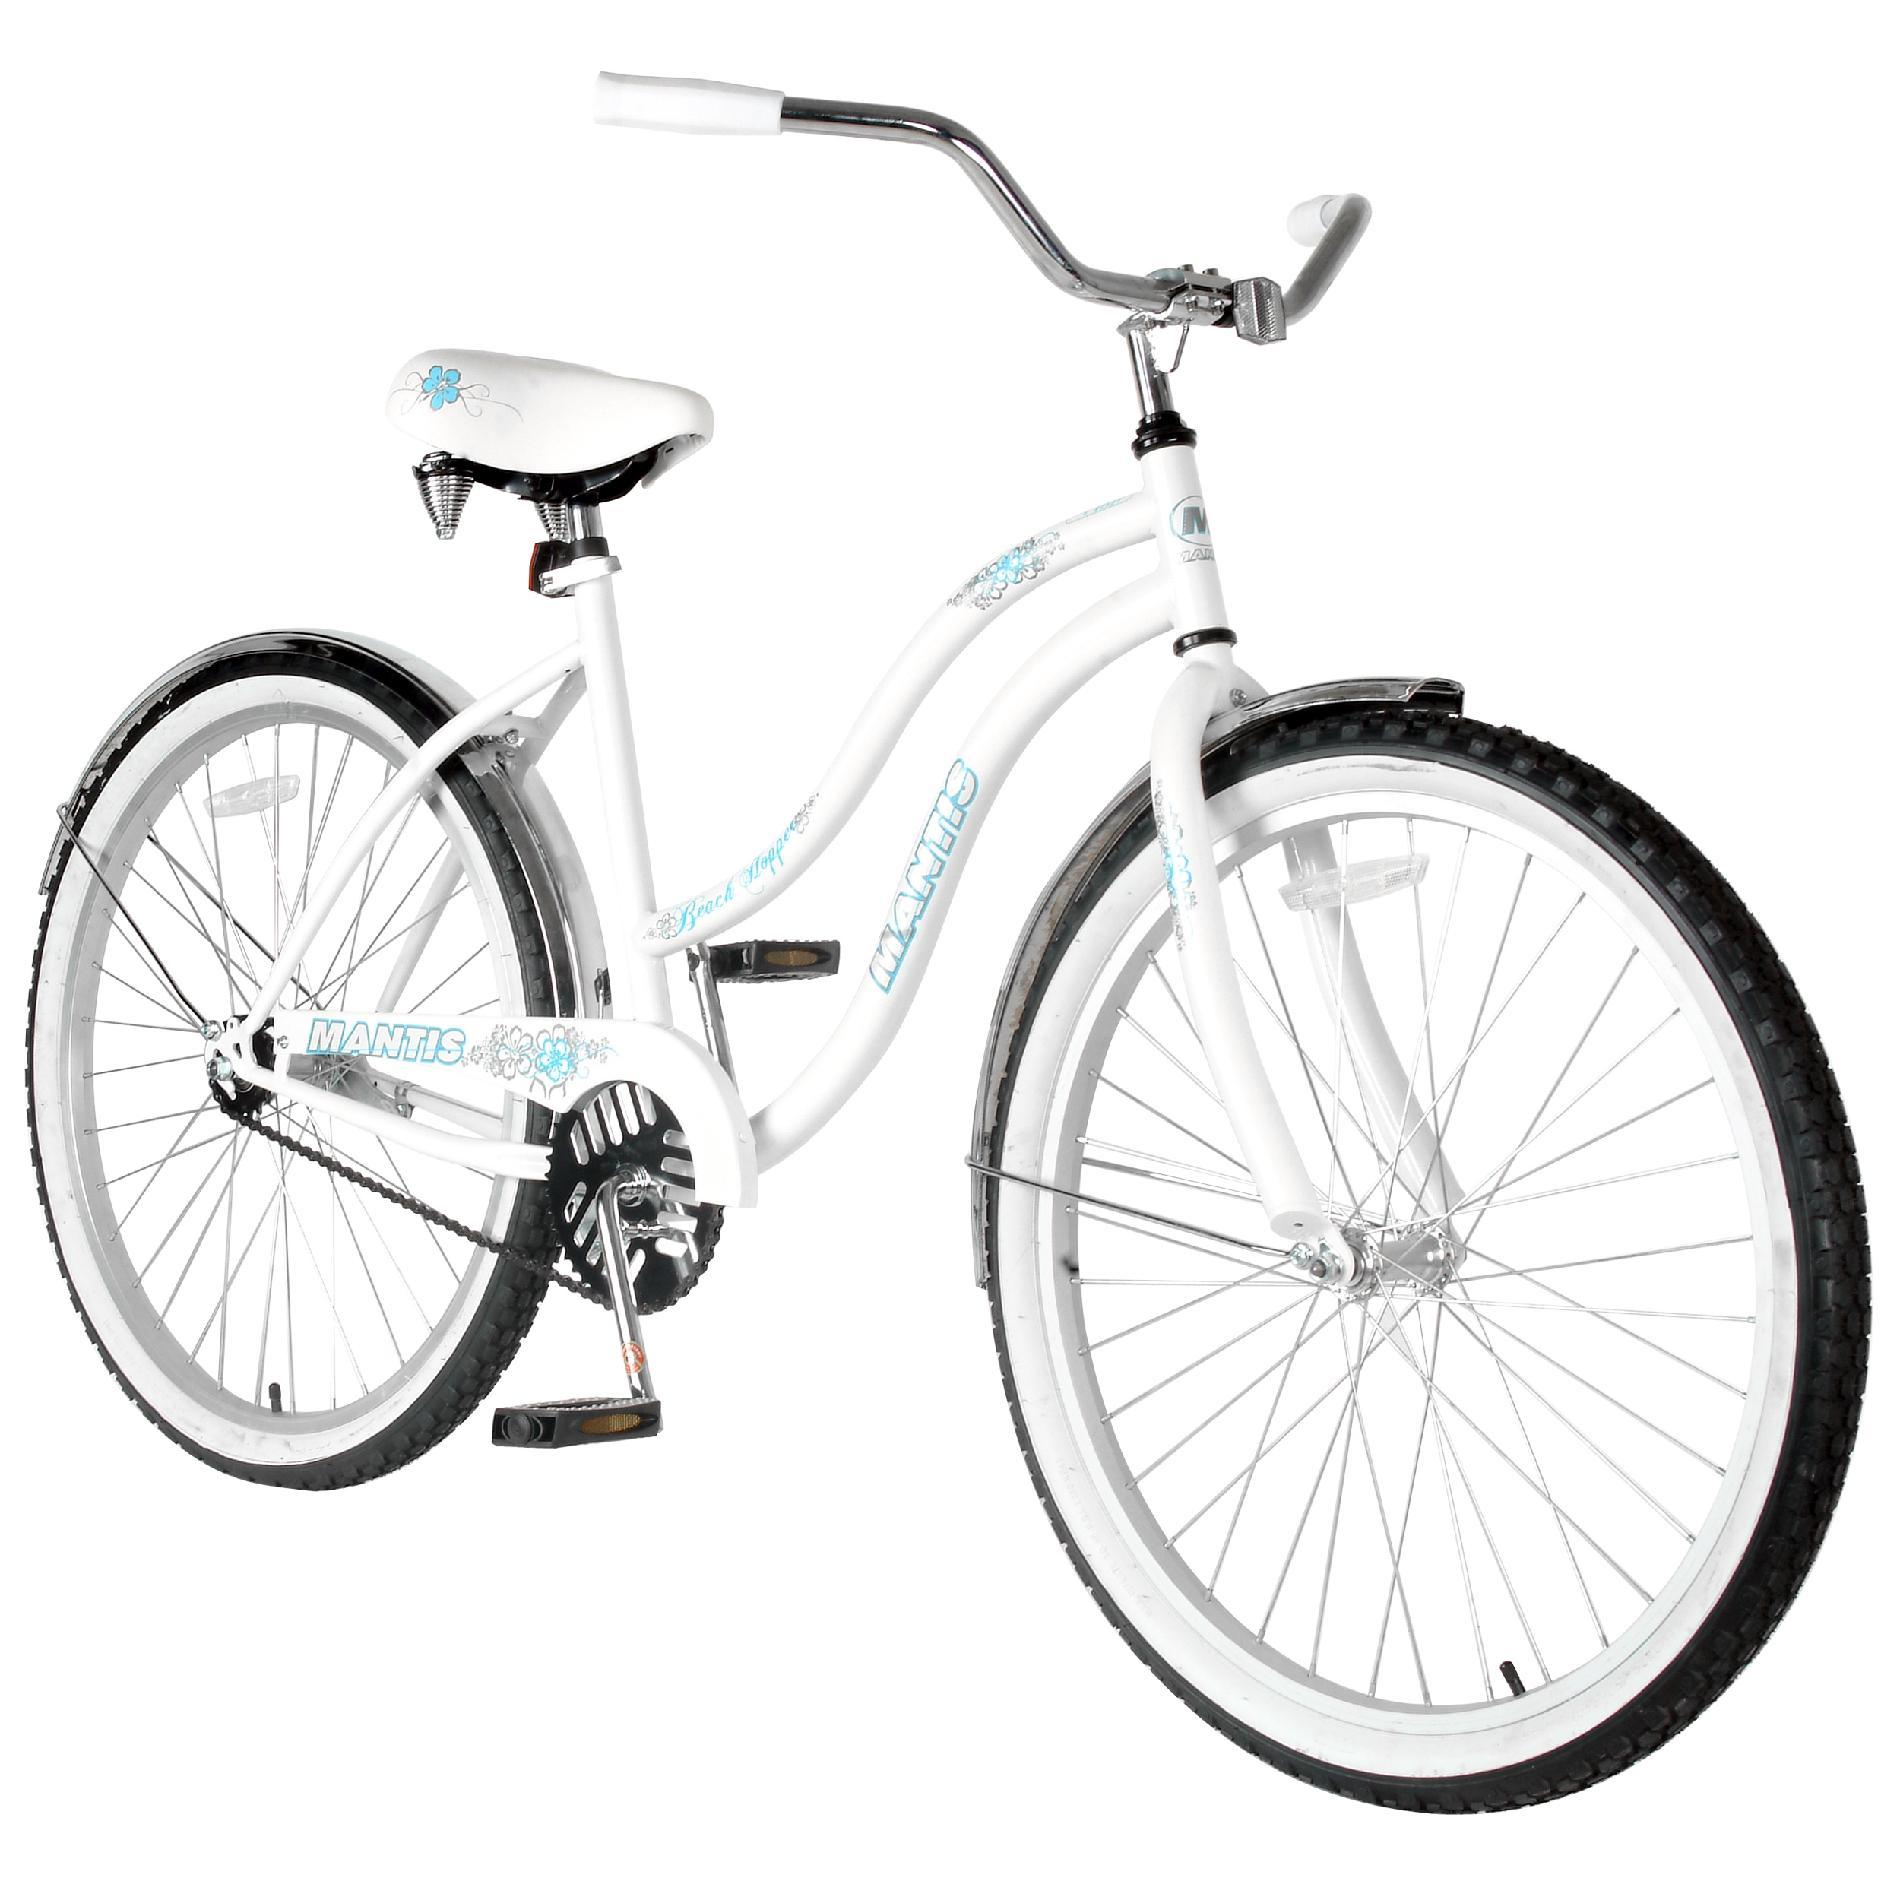 Mantis Beach Hopper 26 Inch Women's Bike